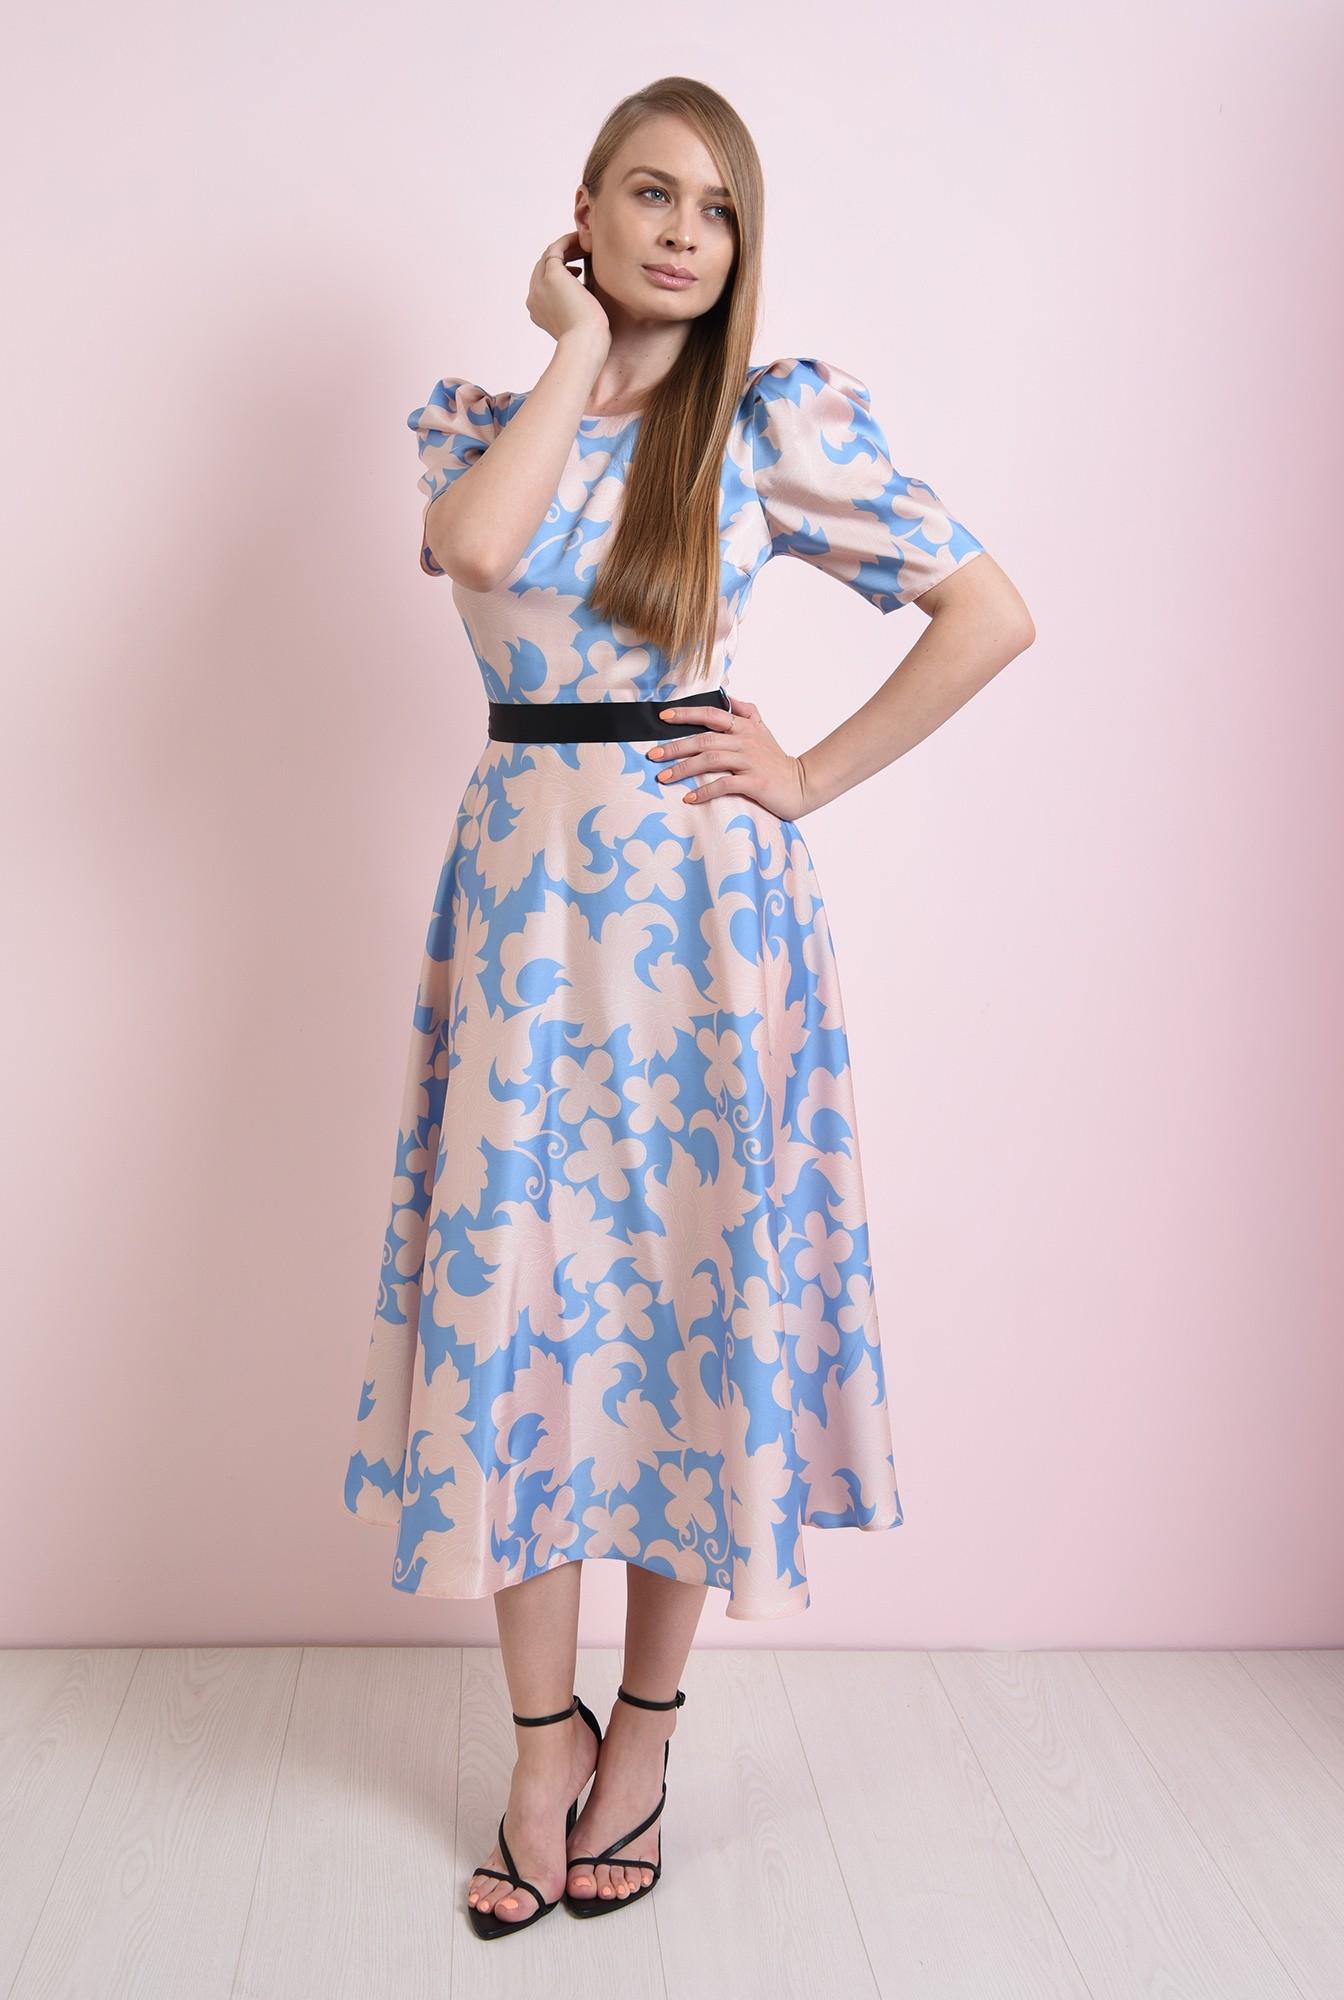 0 - rochie evazata, bleu, cu flori